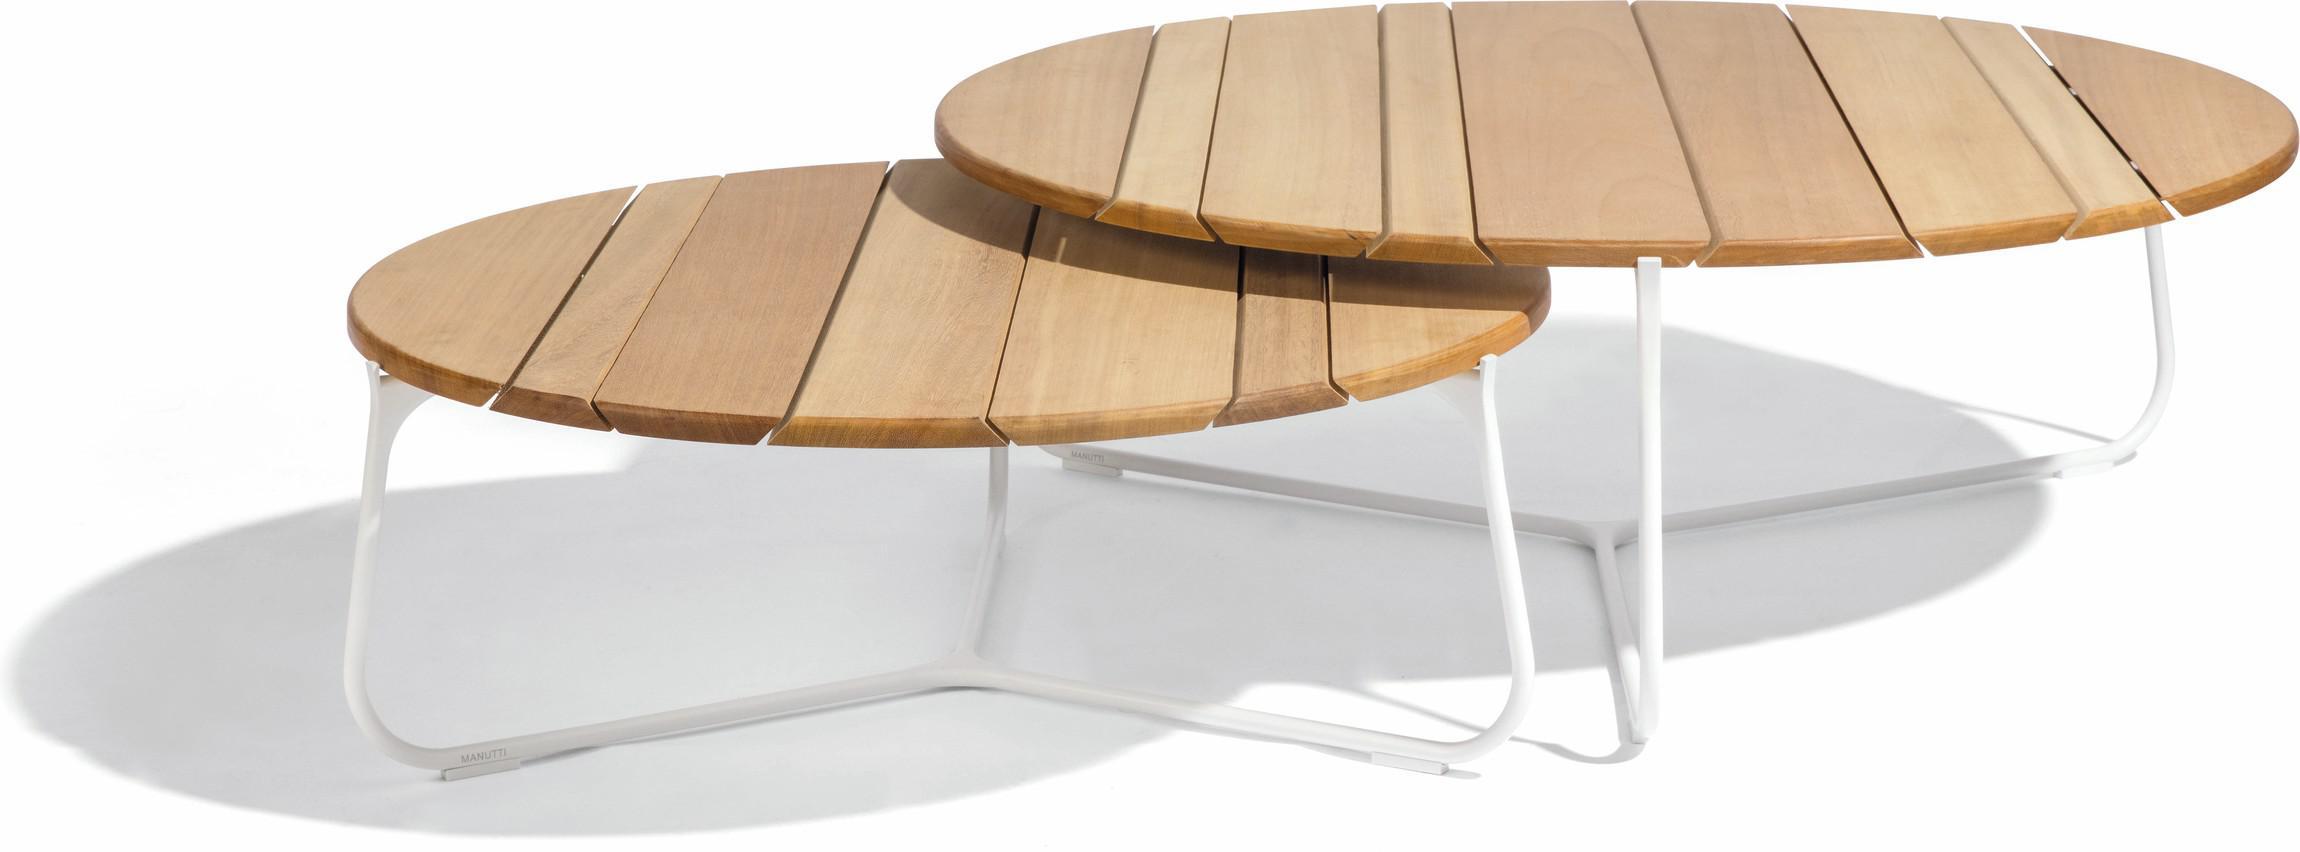 Table basse Mood - blanc - iroko IR - 100